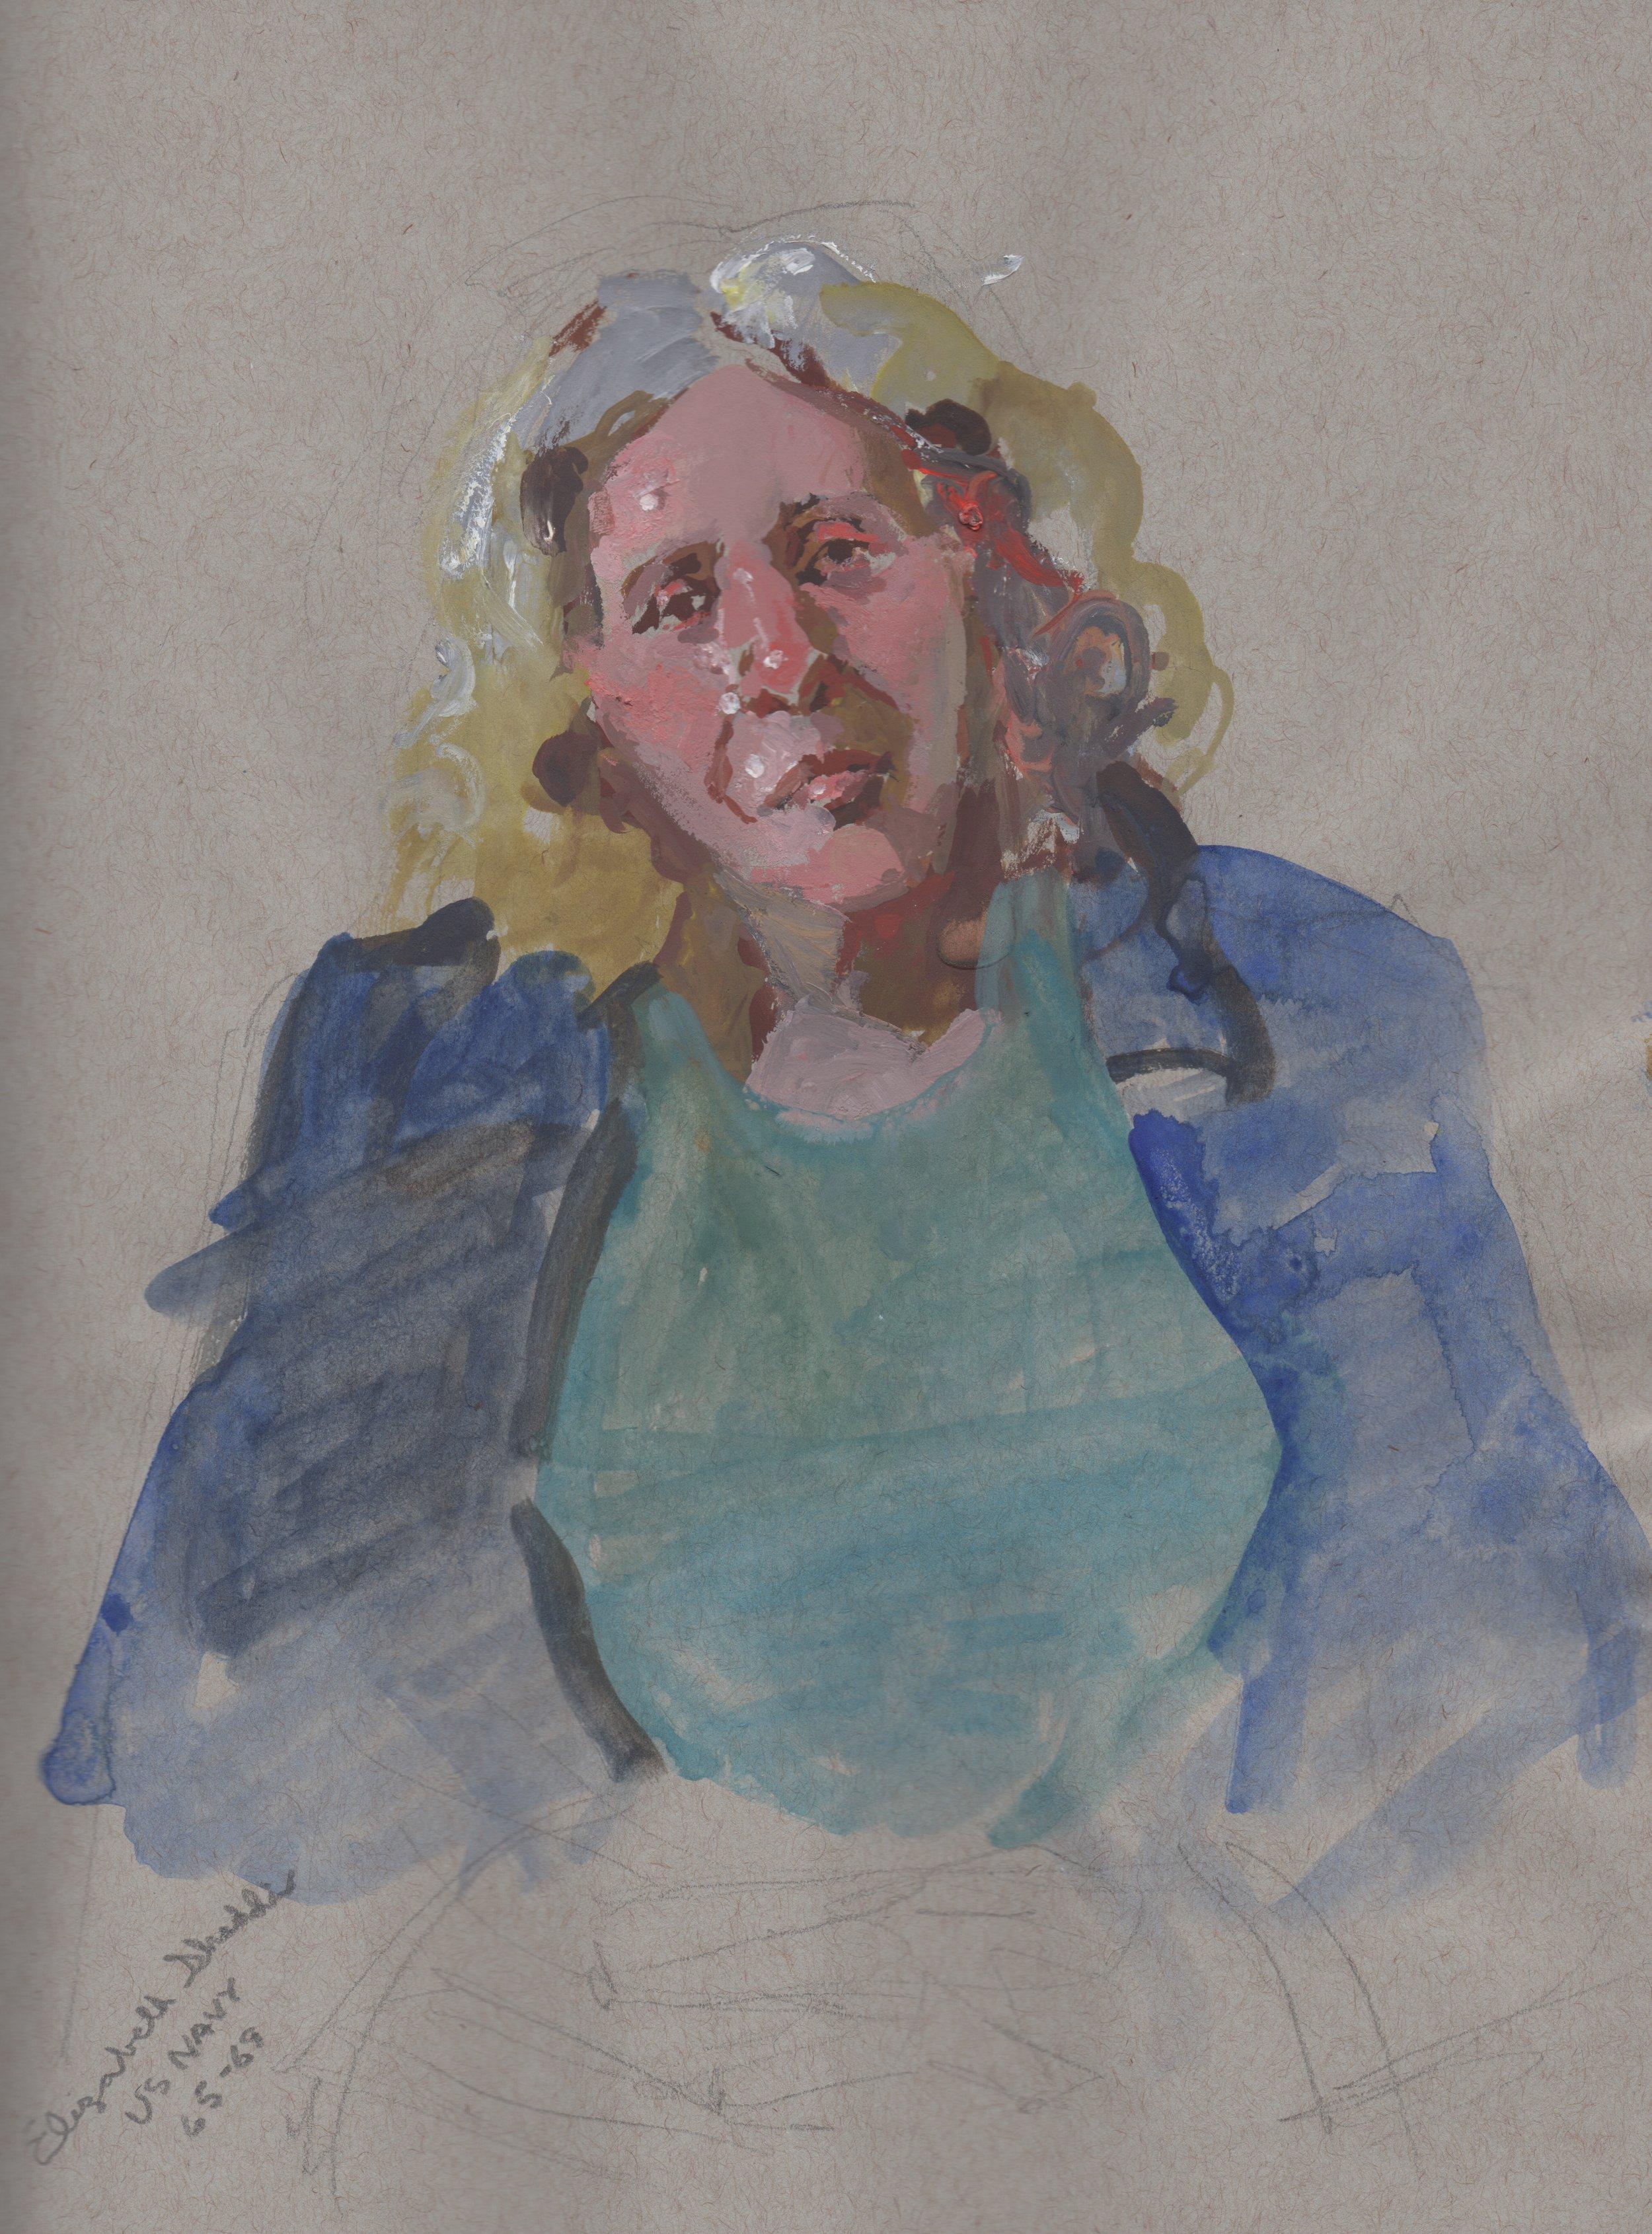 Elizabeth Shaddix